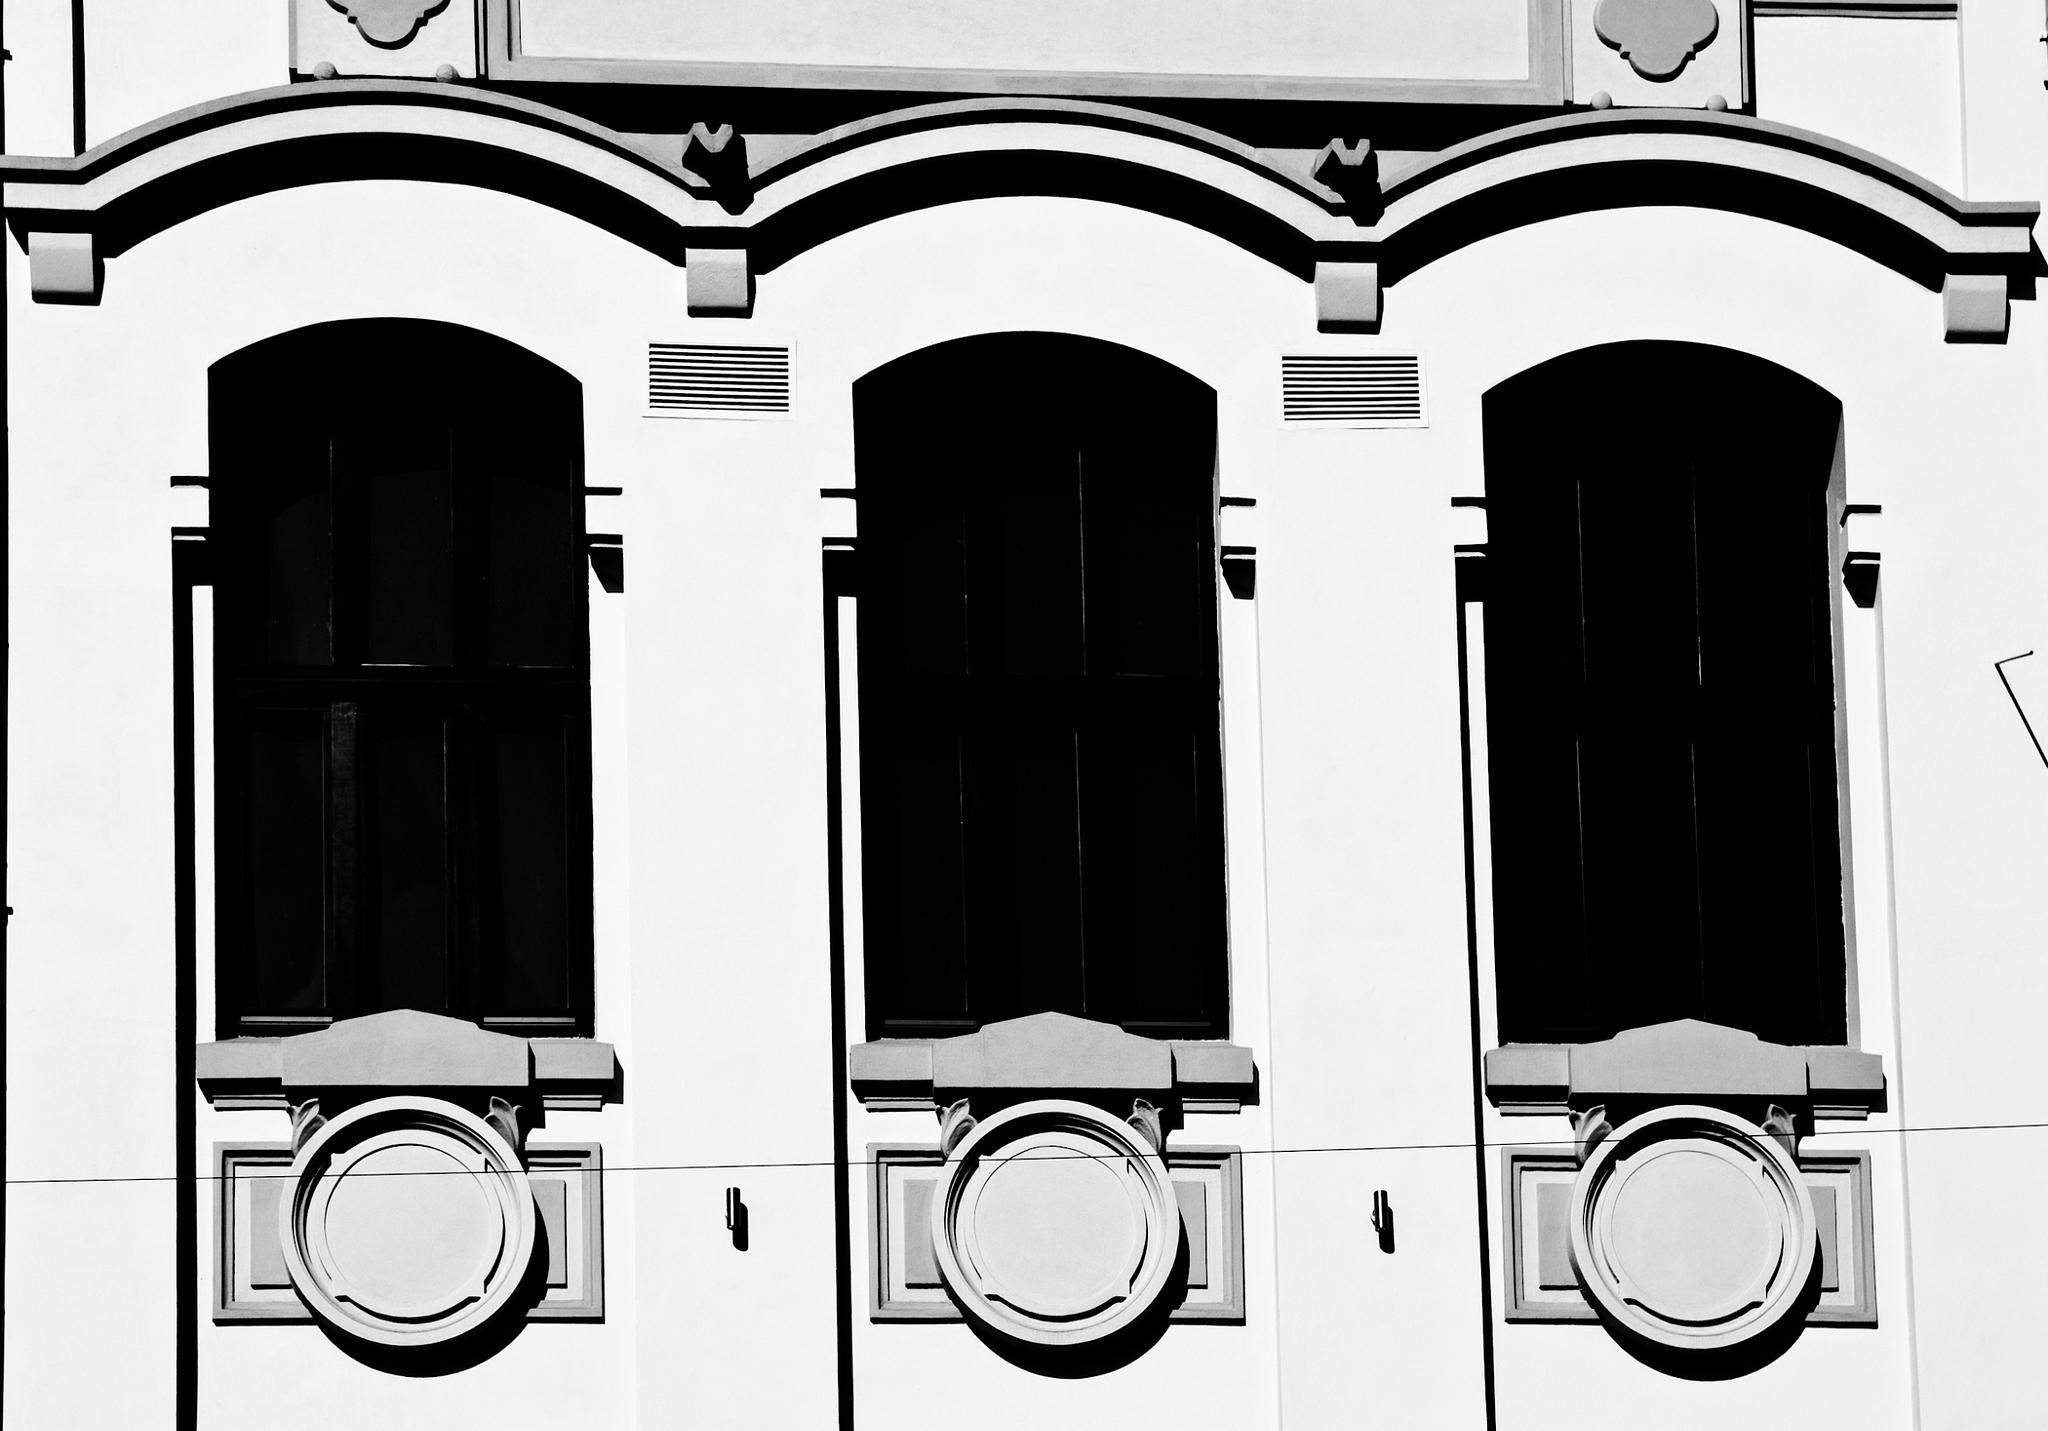 Black windows by Dan Cristian